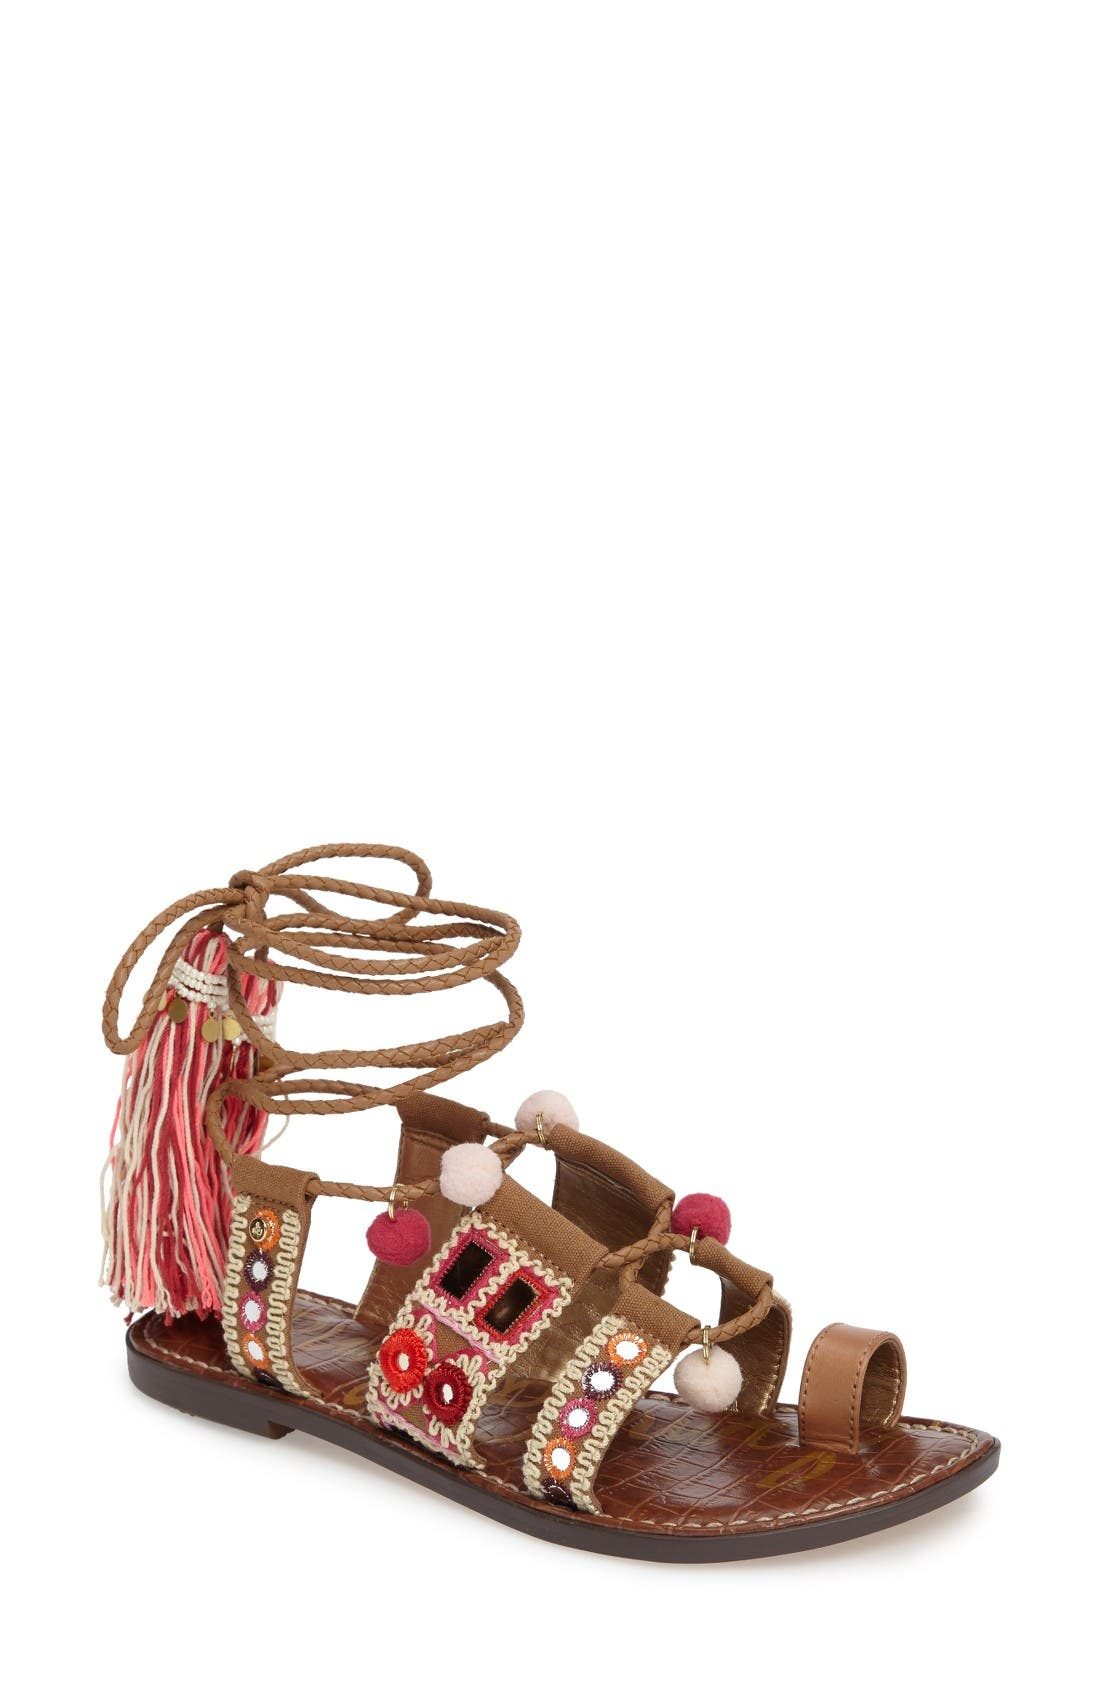 Main Image - Sam Edelman Gretchen Gladiator Sandal (Women)